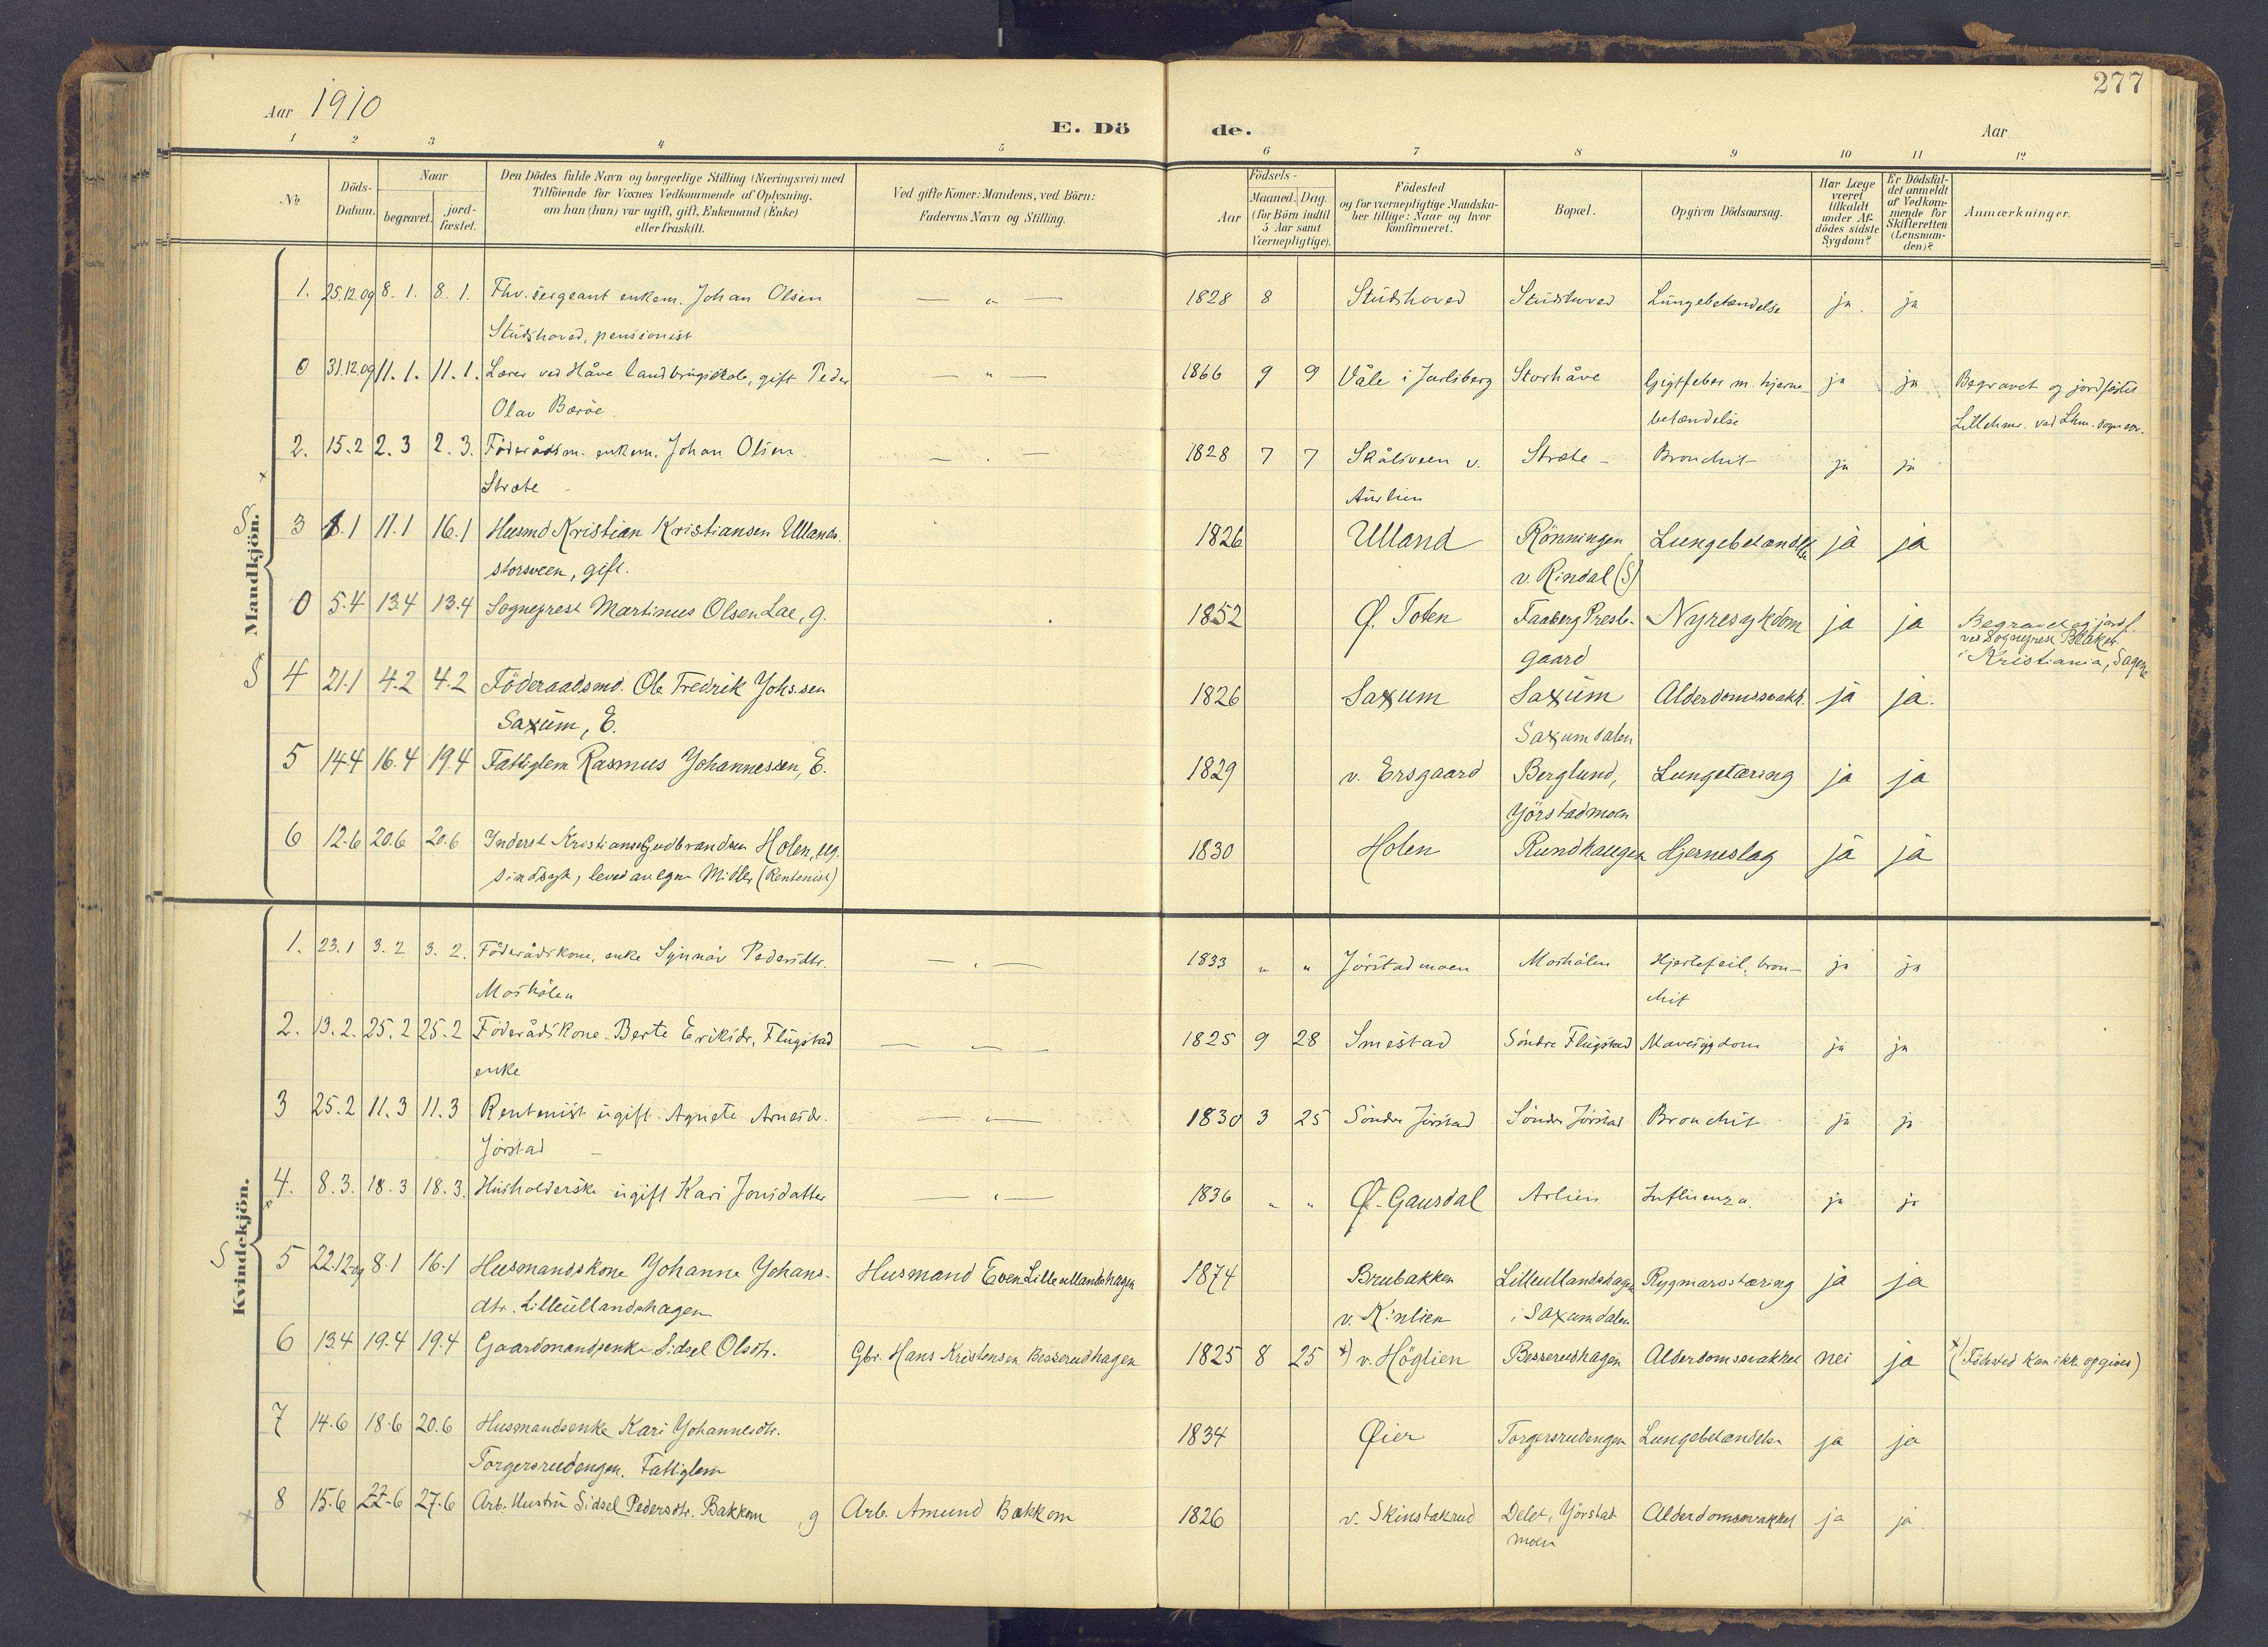 SAH, Fåberg prestekontor, Ministerialbok nr. 12, 1899-1915, s. 277